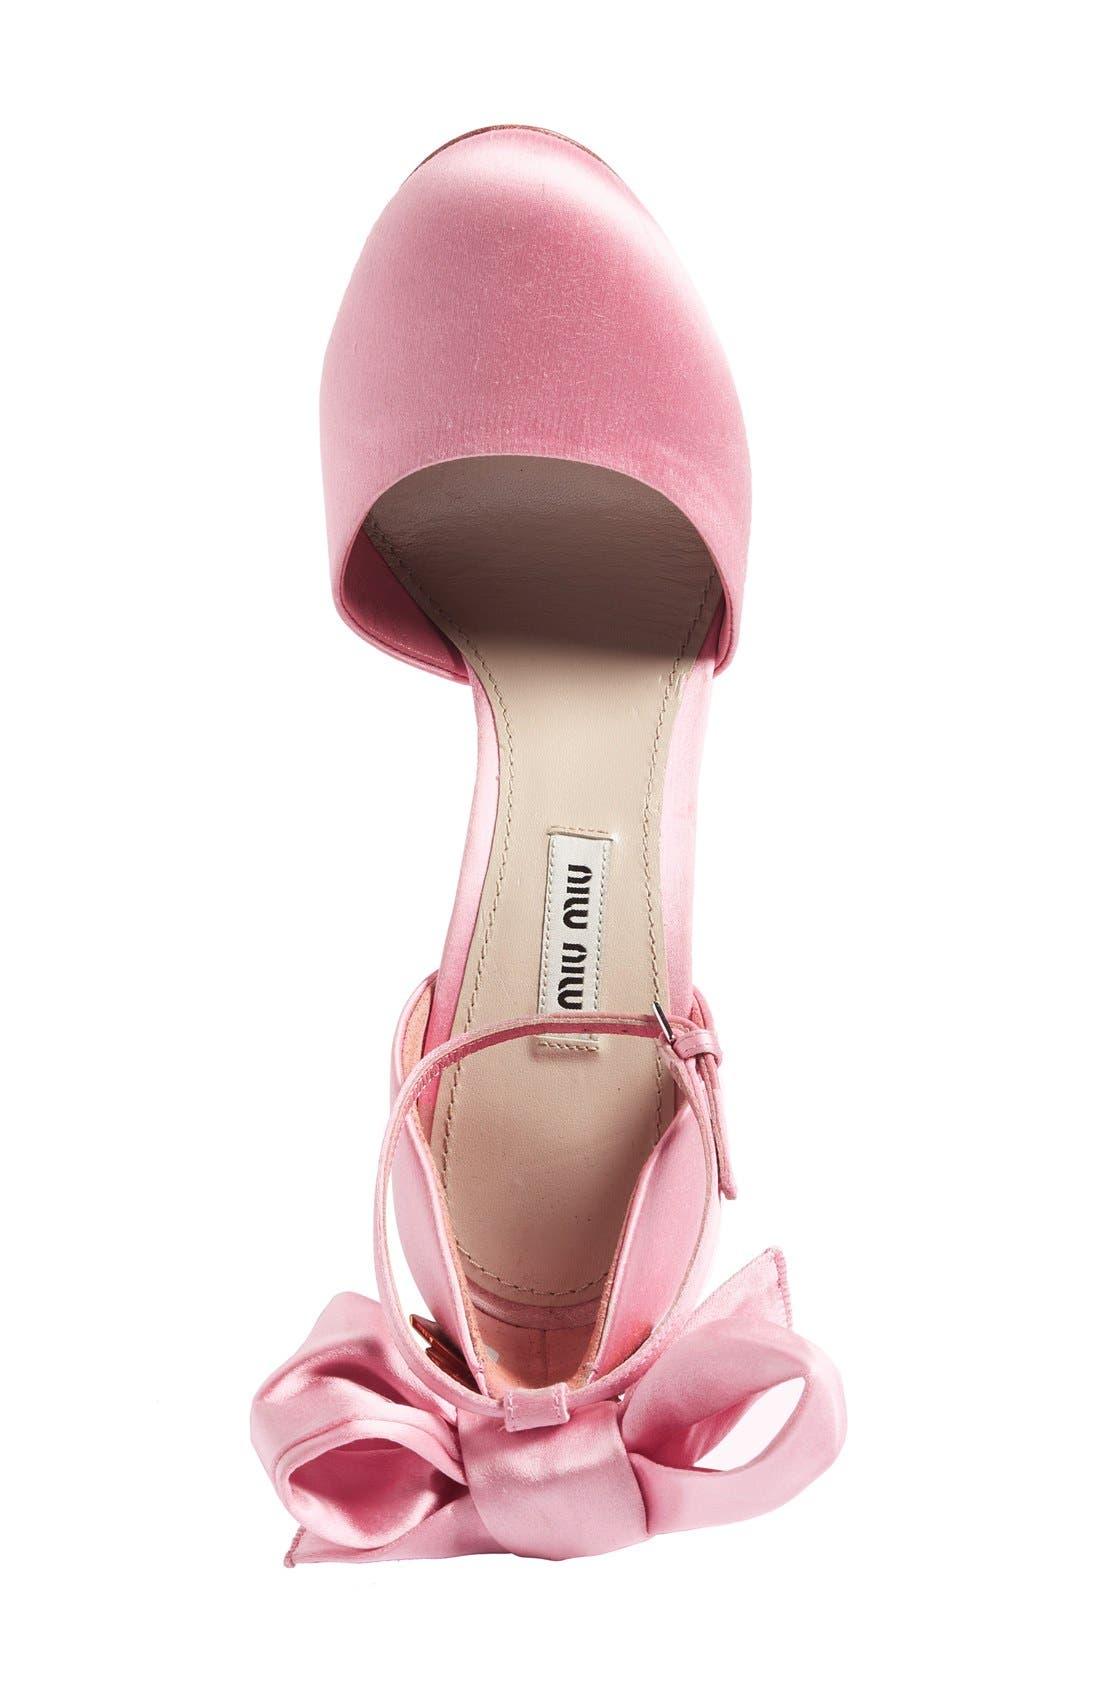 MIU MIU,                             Crystal Bow Tie Ankle Strap Pump,                             Alternate thumbnail 4, color,                             650